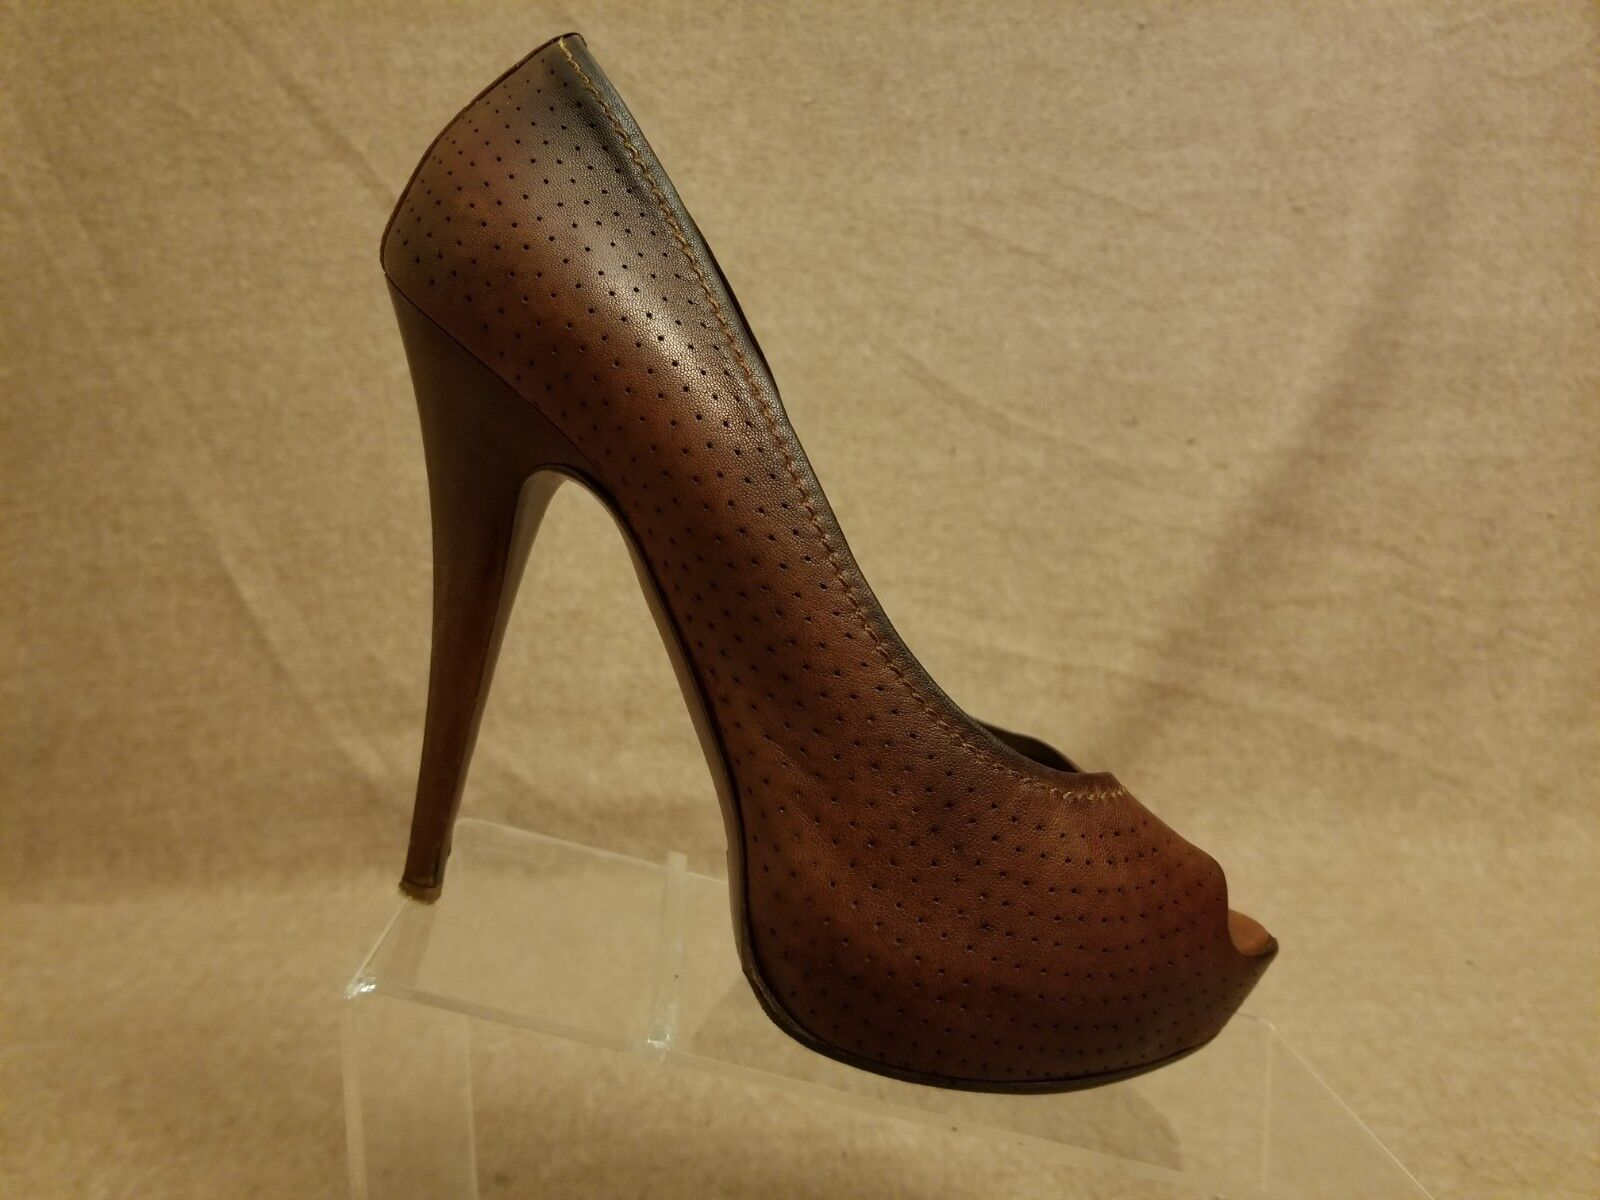 negozio all'ingrosso Miu Miu Donna  Marrone Leather Leather Leather Pumps High Heels Peep Toe Perforated scarpe Dimensione 40  garanzia di credito